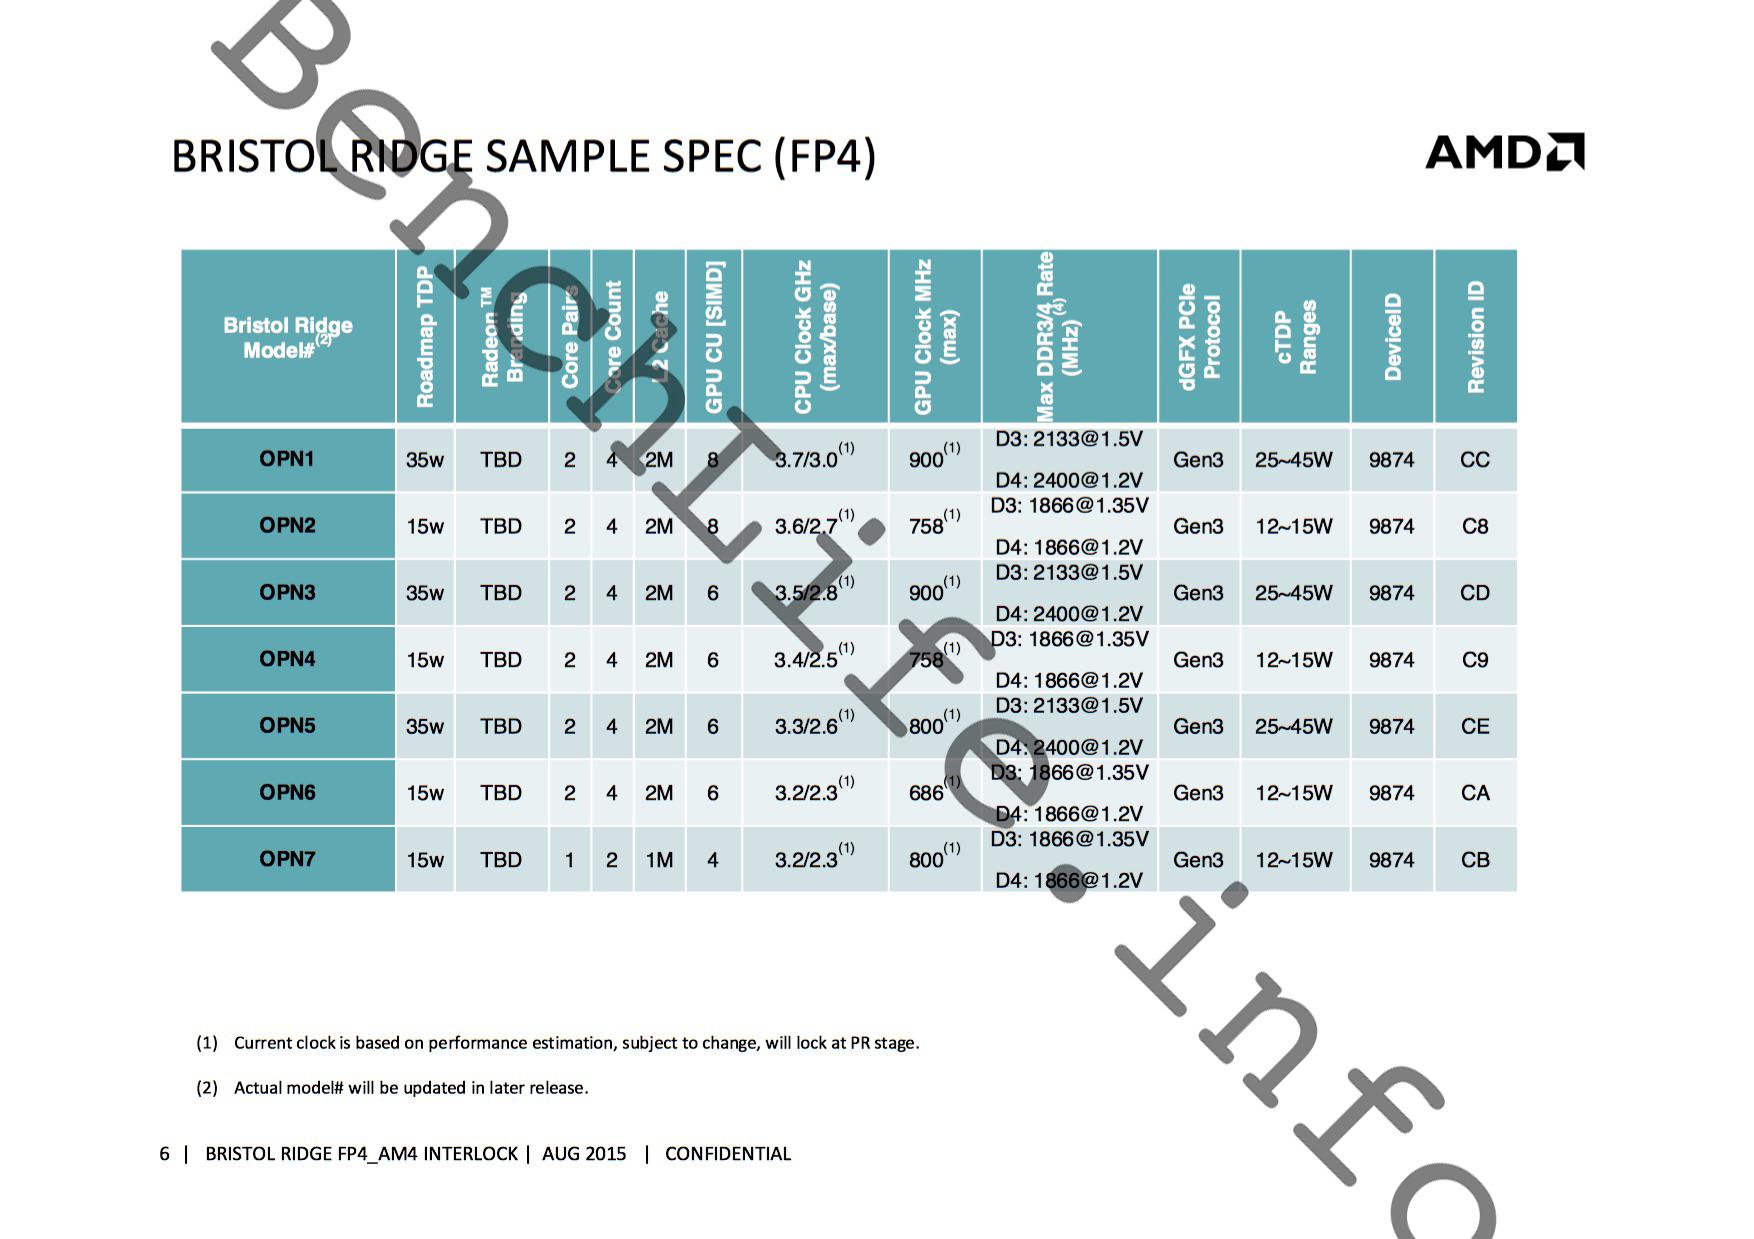 AMD Bristol Ridge APU Family For AM4 and FP4 Platforms ...